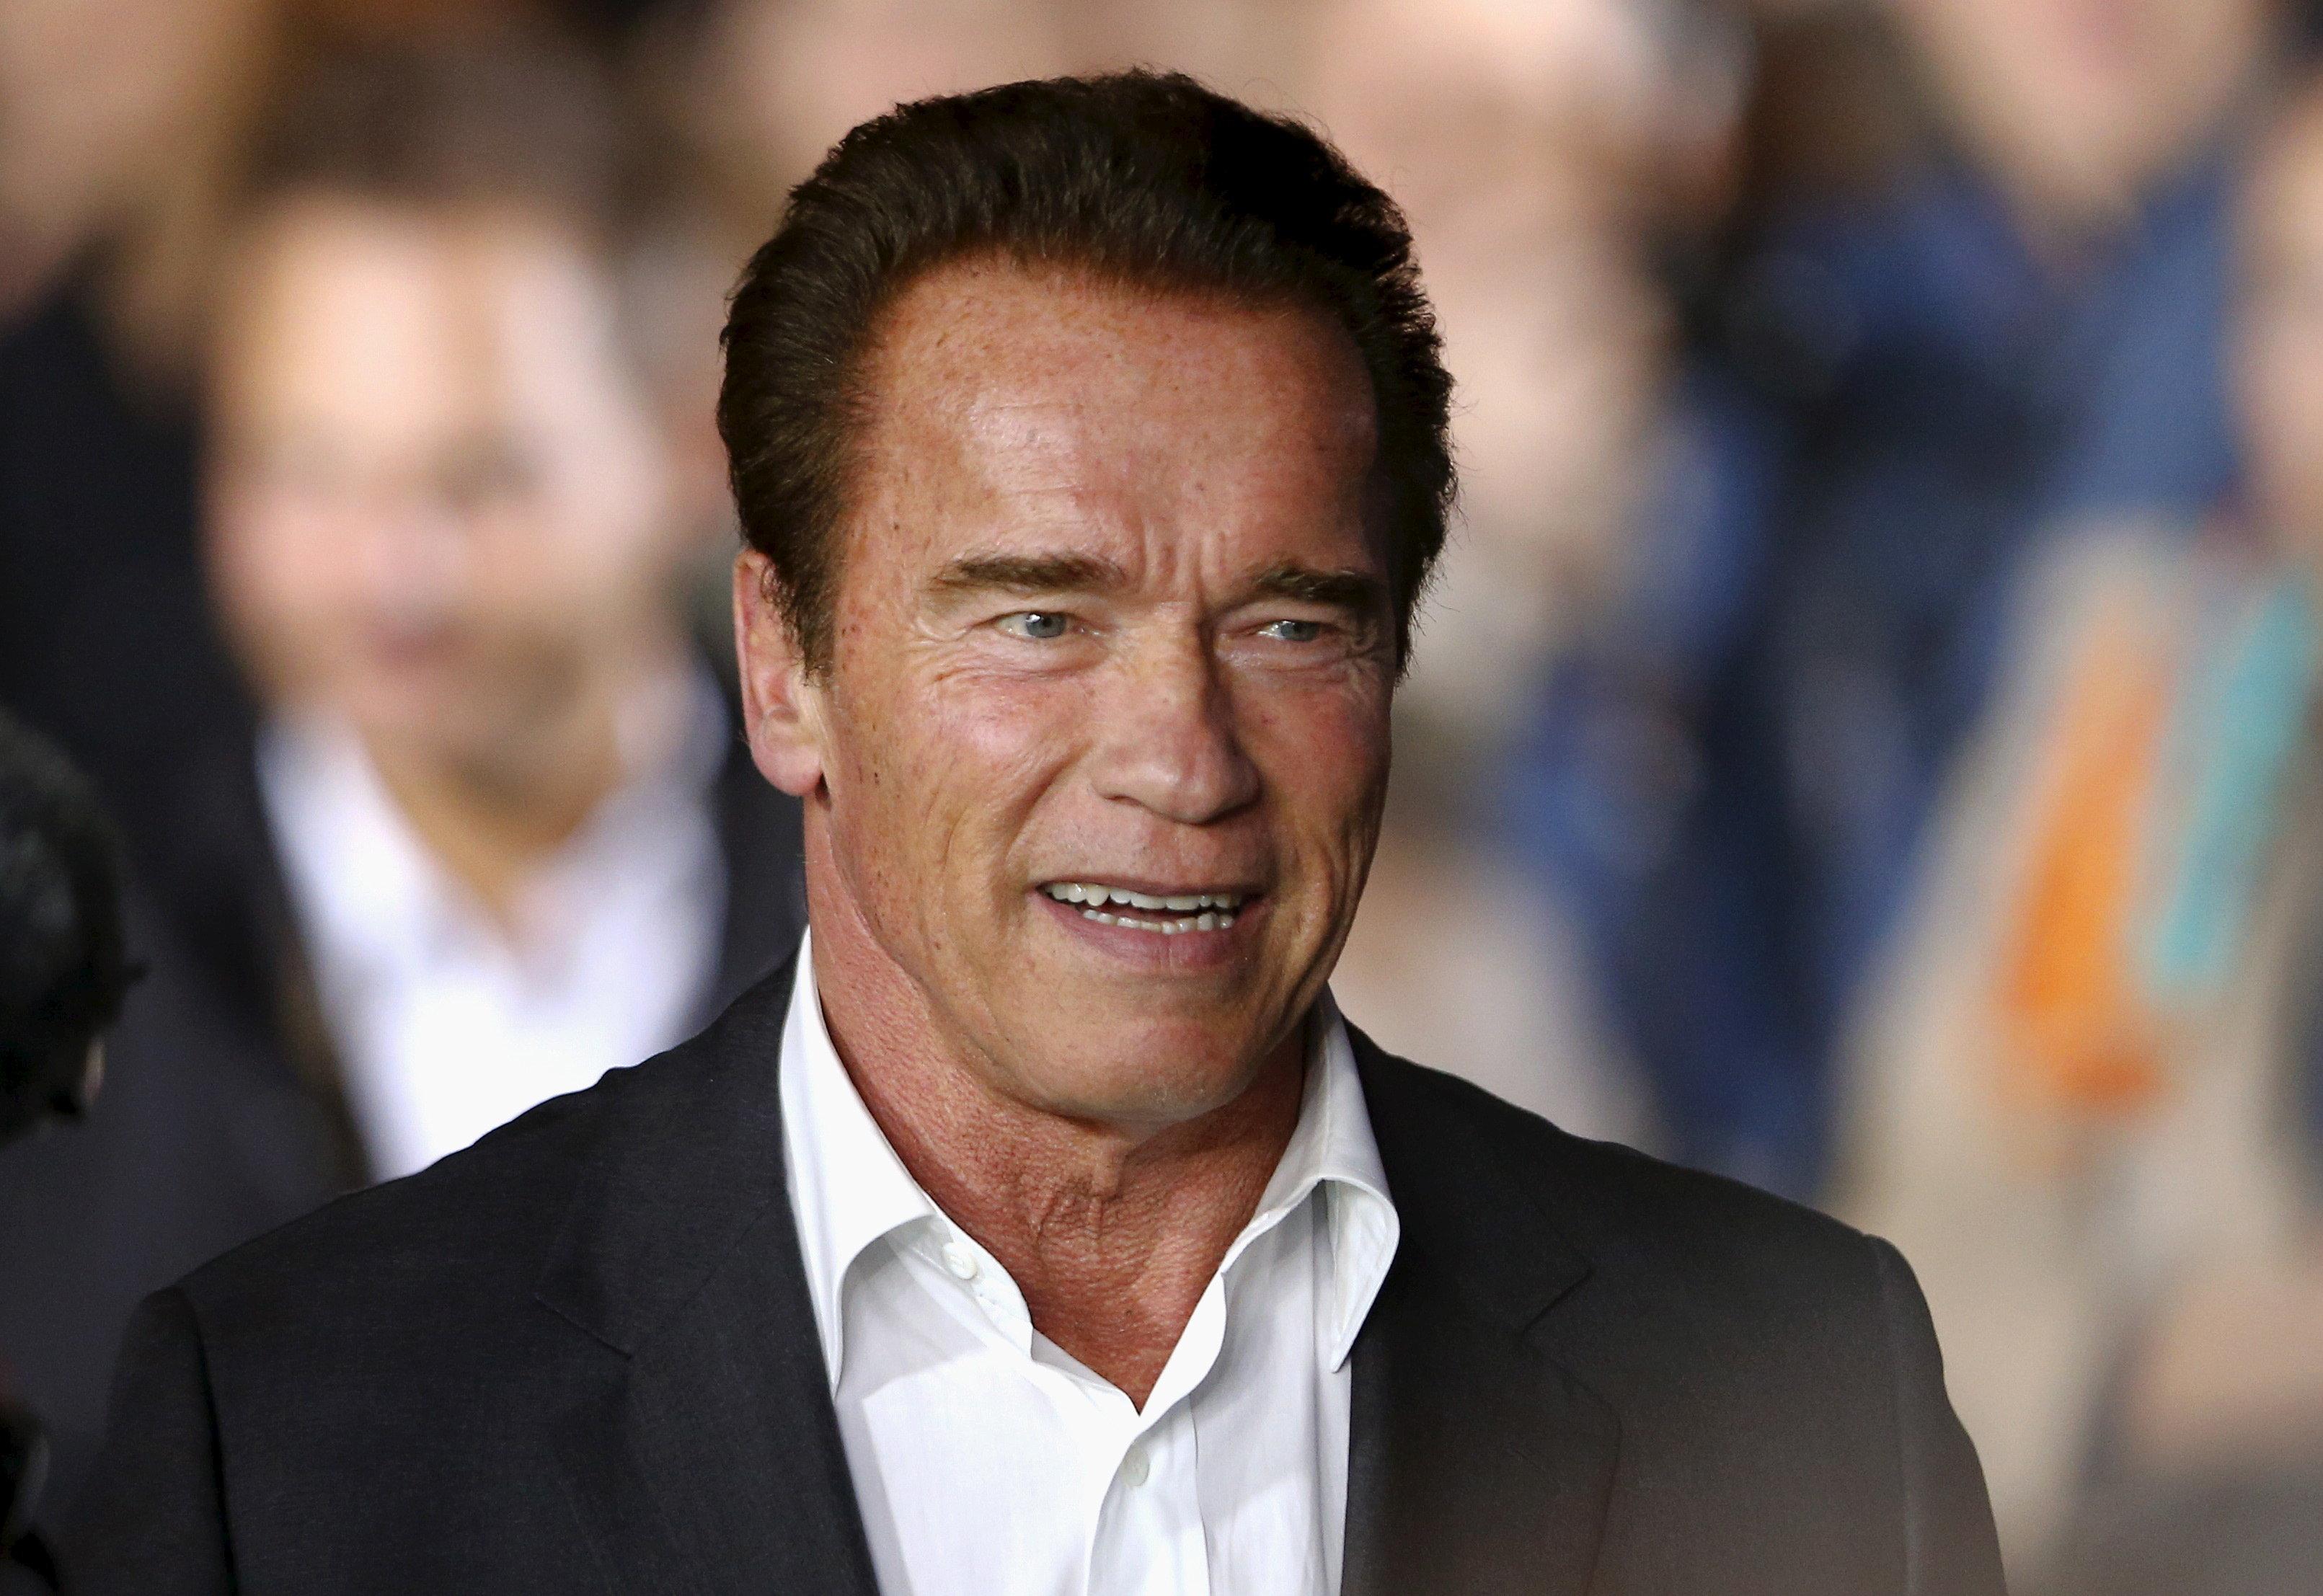 Austrian-born actor Arnold Schwarzenegger arrives before the award ceremony for the Golden Icon Award at the Zurich Film Festival in Zurich, Switzerland, September 30, 2015. REUTERS/Arnd Wiegmann